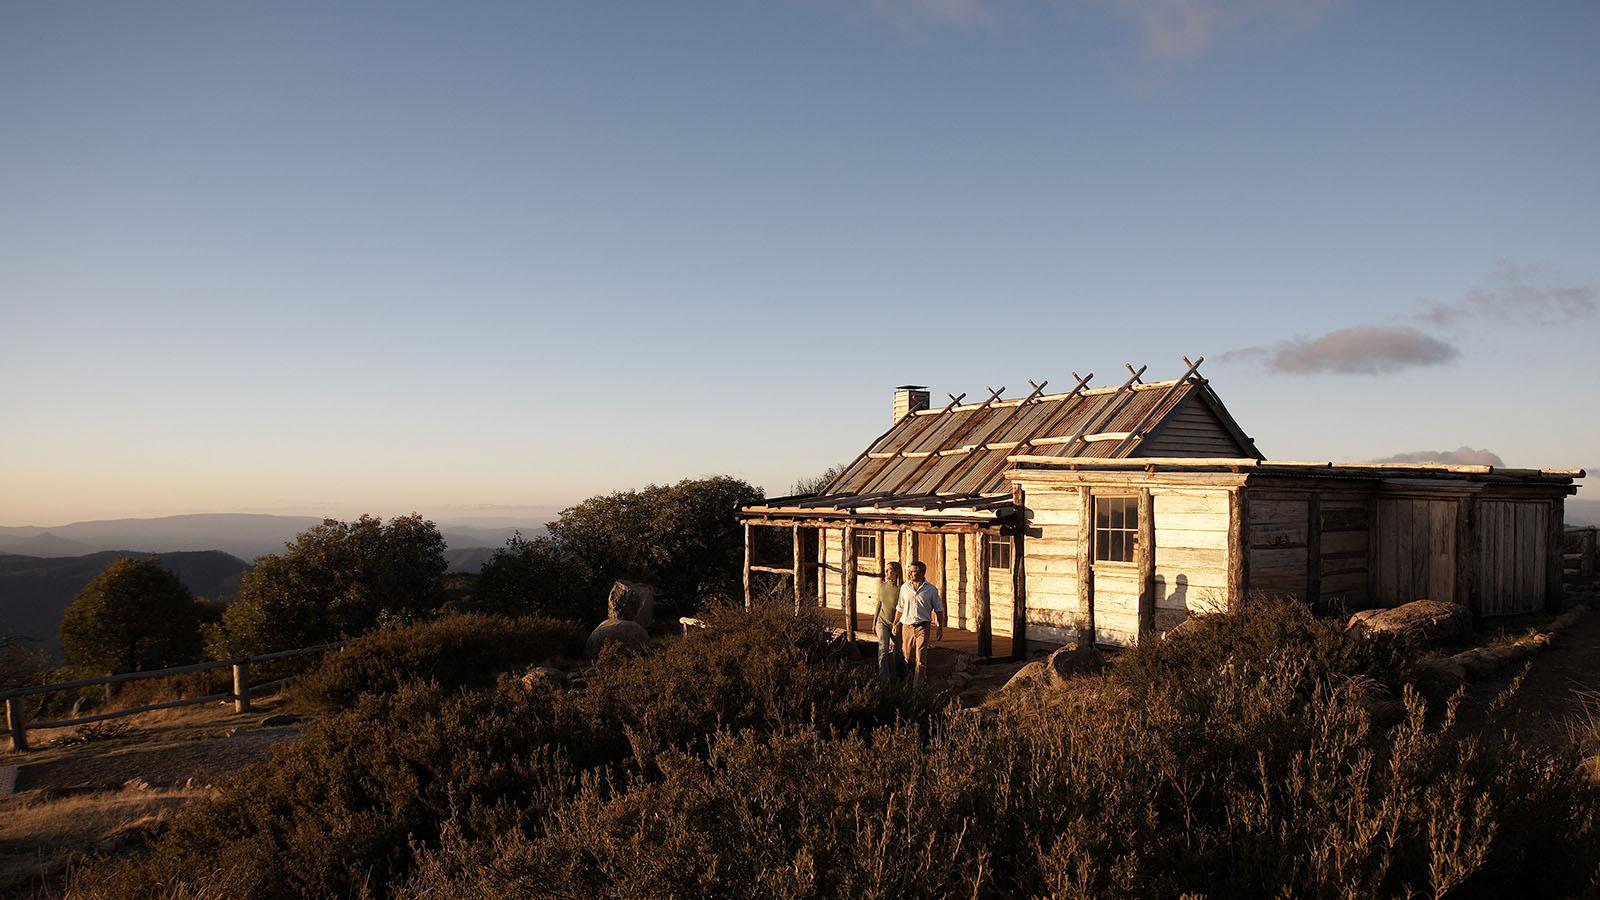 Craigs Hut, High Country, Victoria, Australia